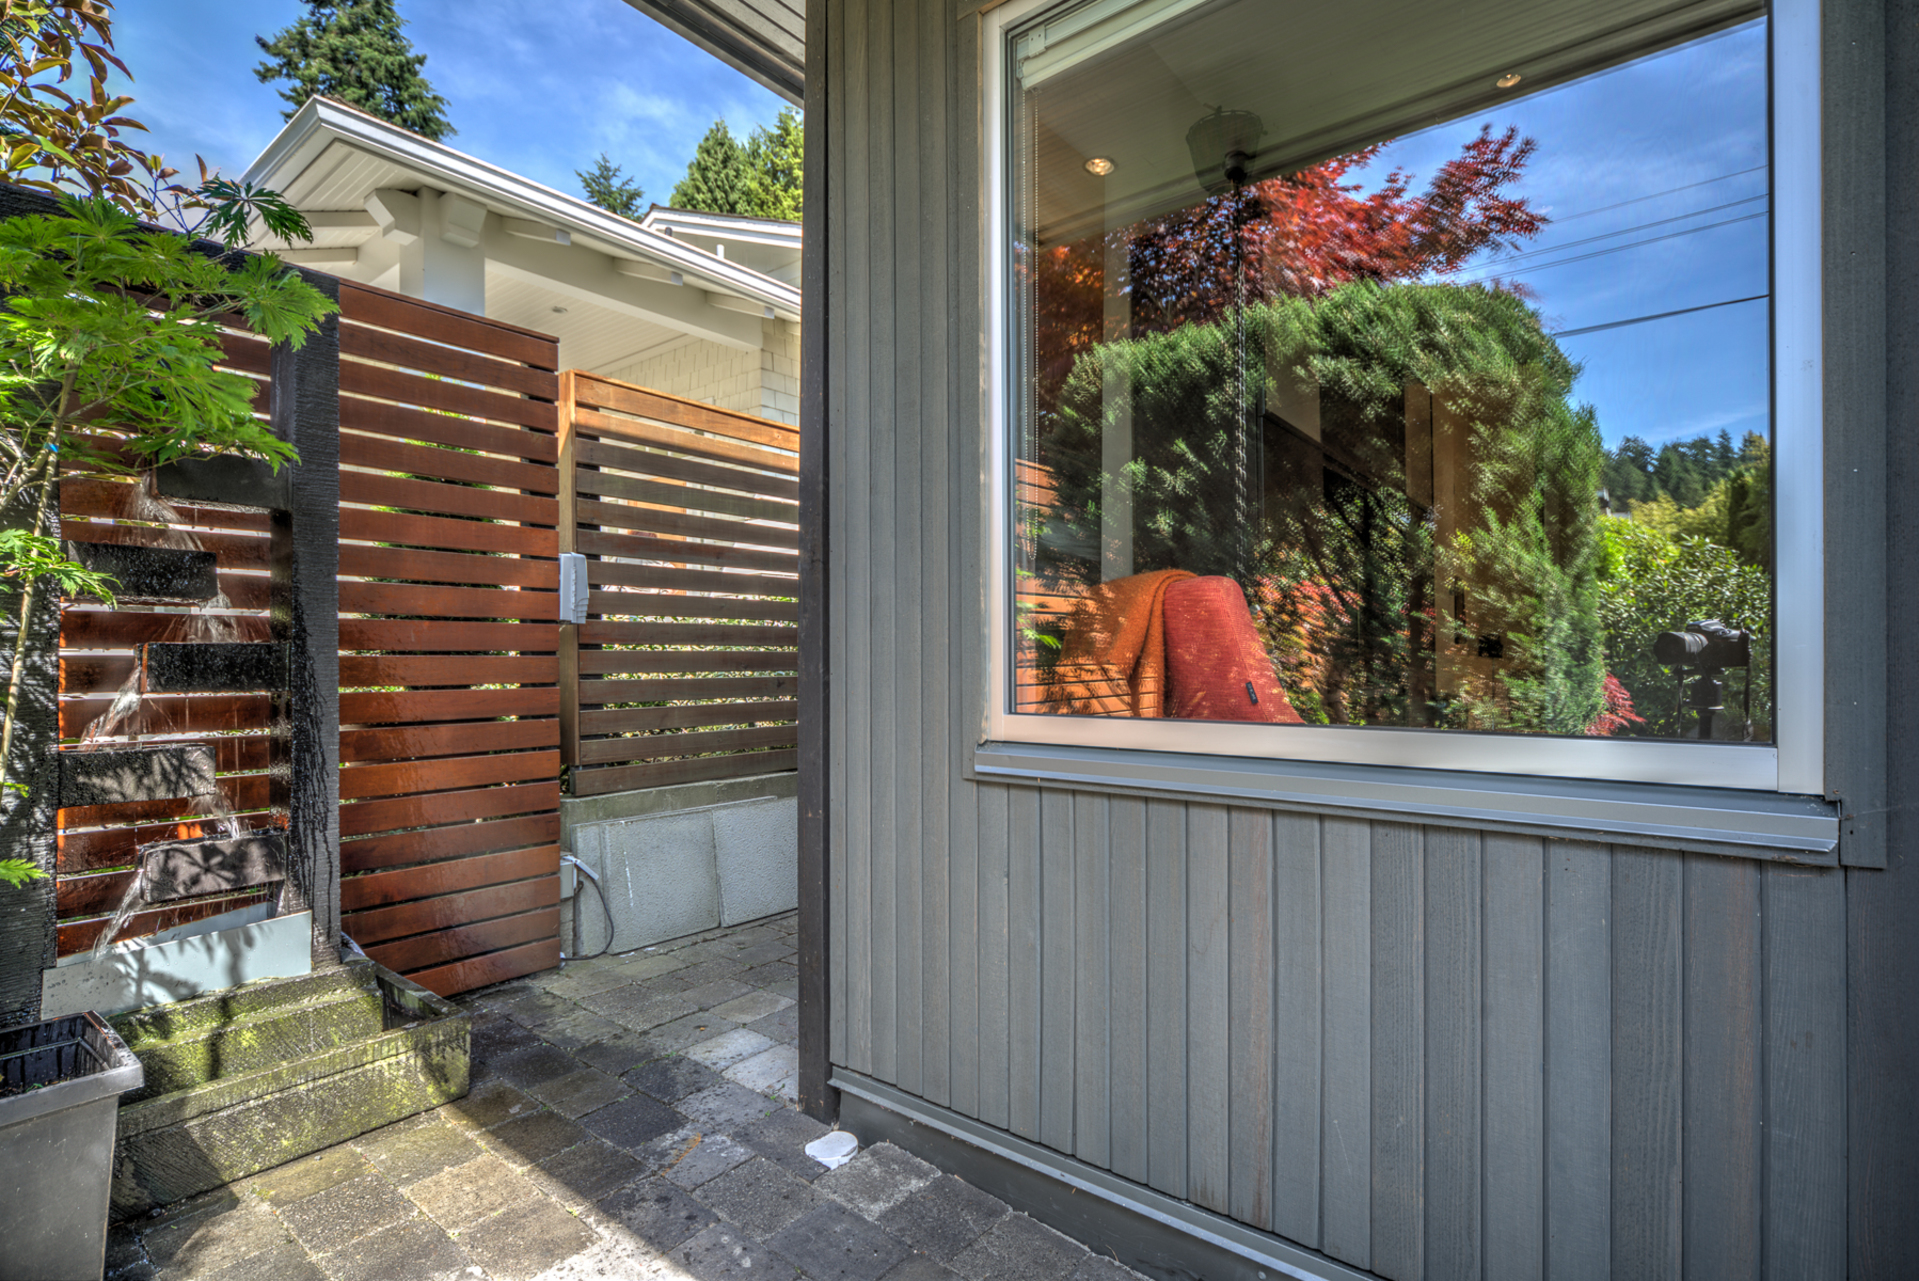 4362-stearman-ave-wv-360hometours-30s at 4362 Stearman Avenue, Caulfeild, West Vancouver